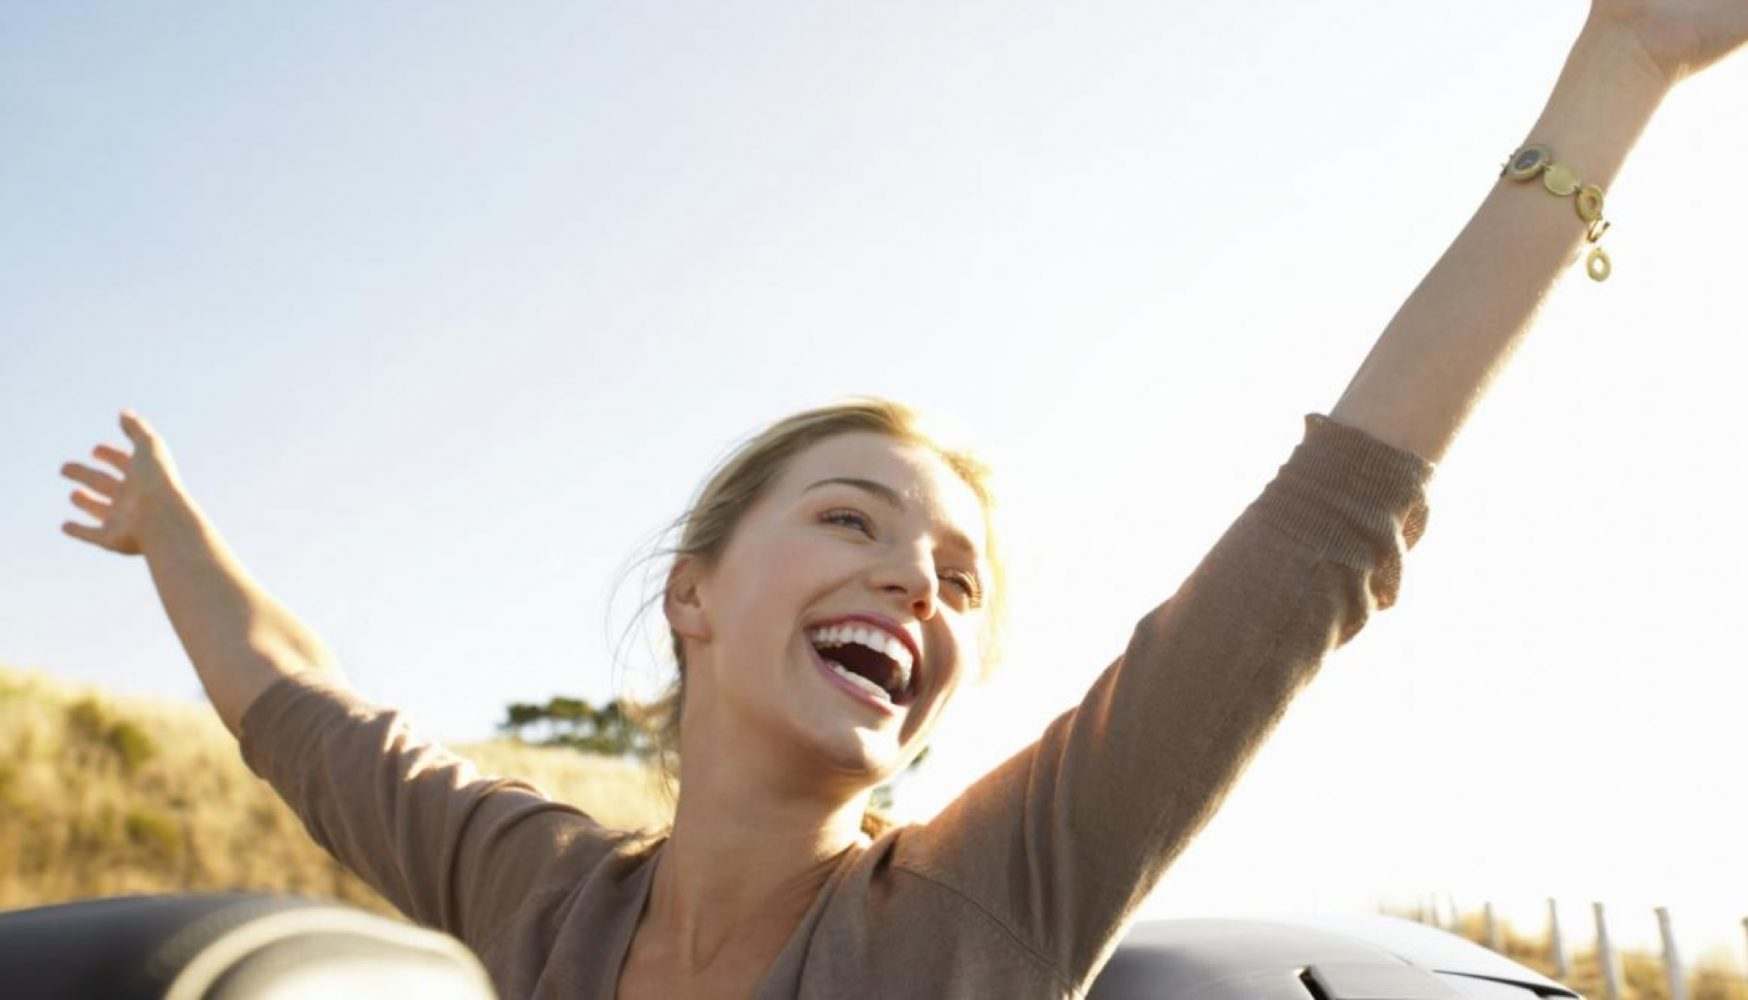 Alimentos que benefician a tu estado de ánimo